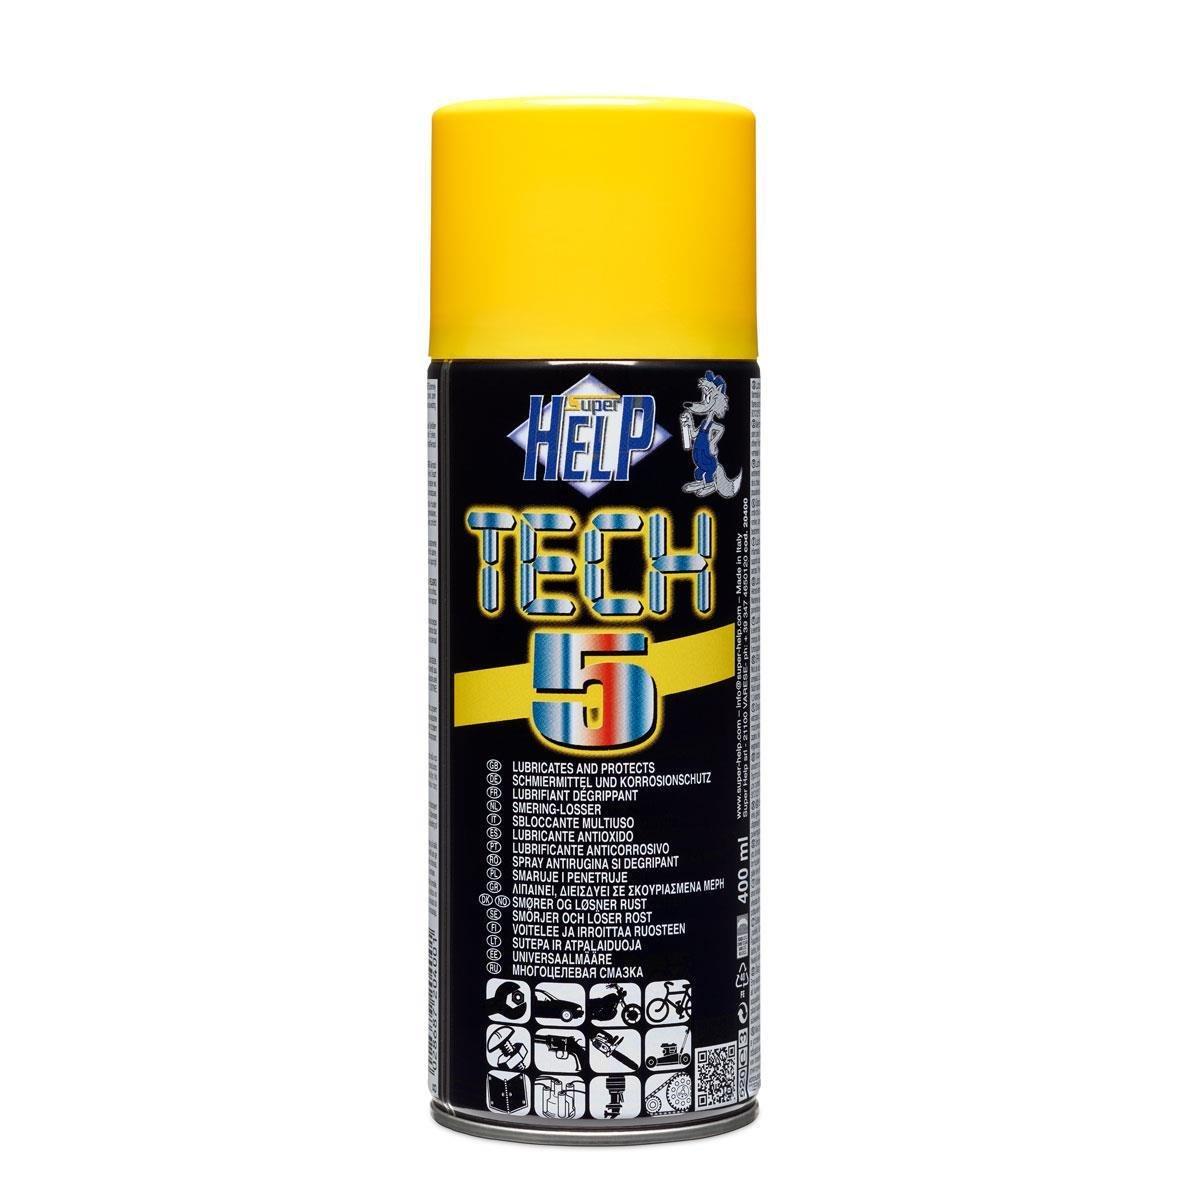 SUPERHELP TECH 5 Multipurpose Grease 400ml